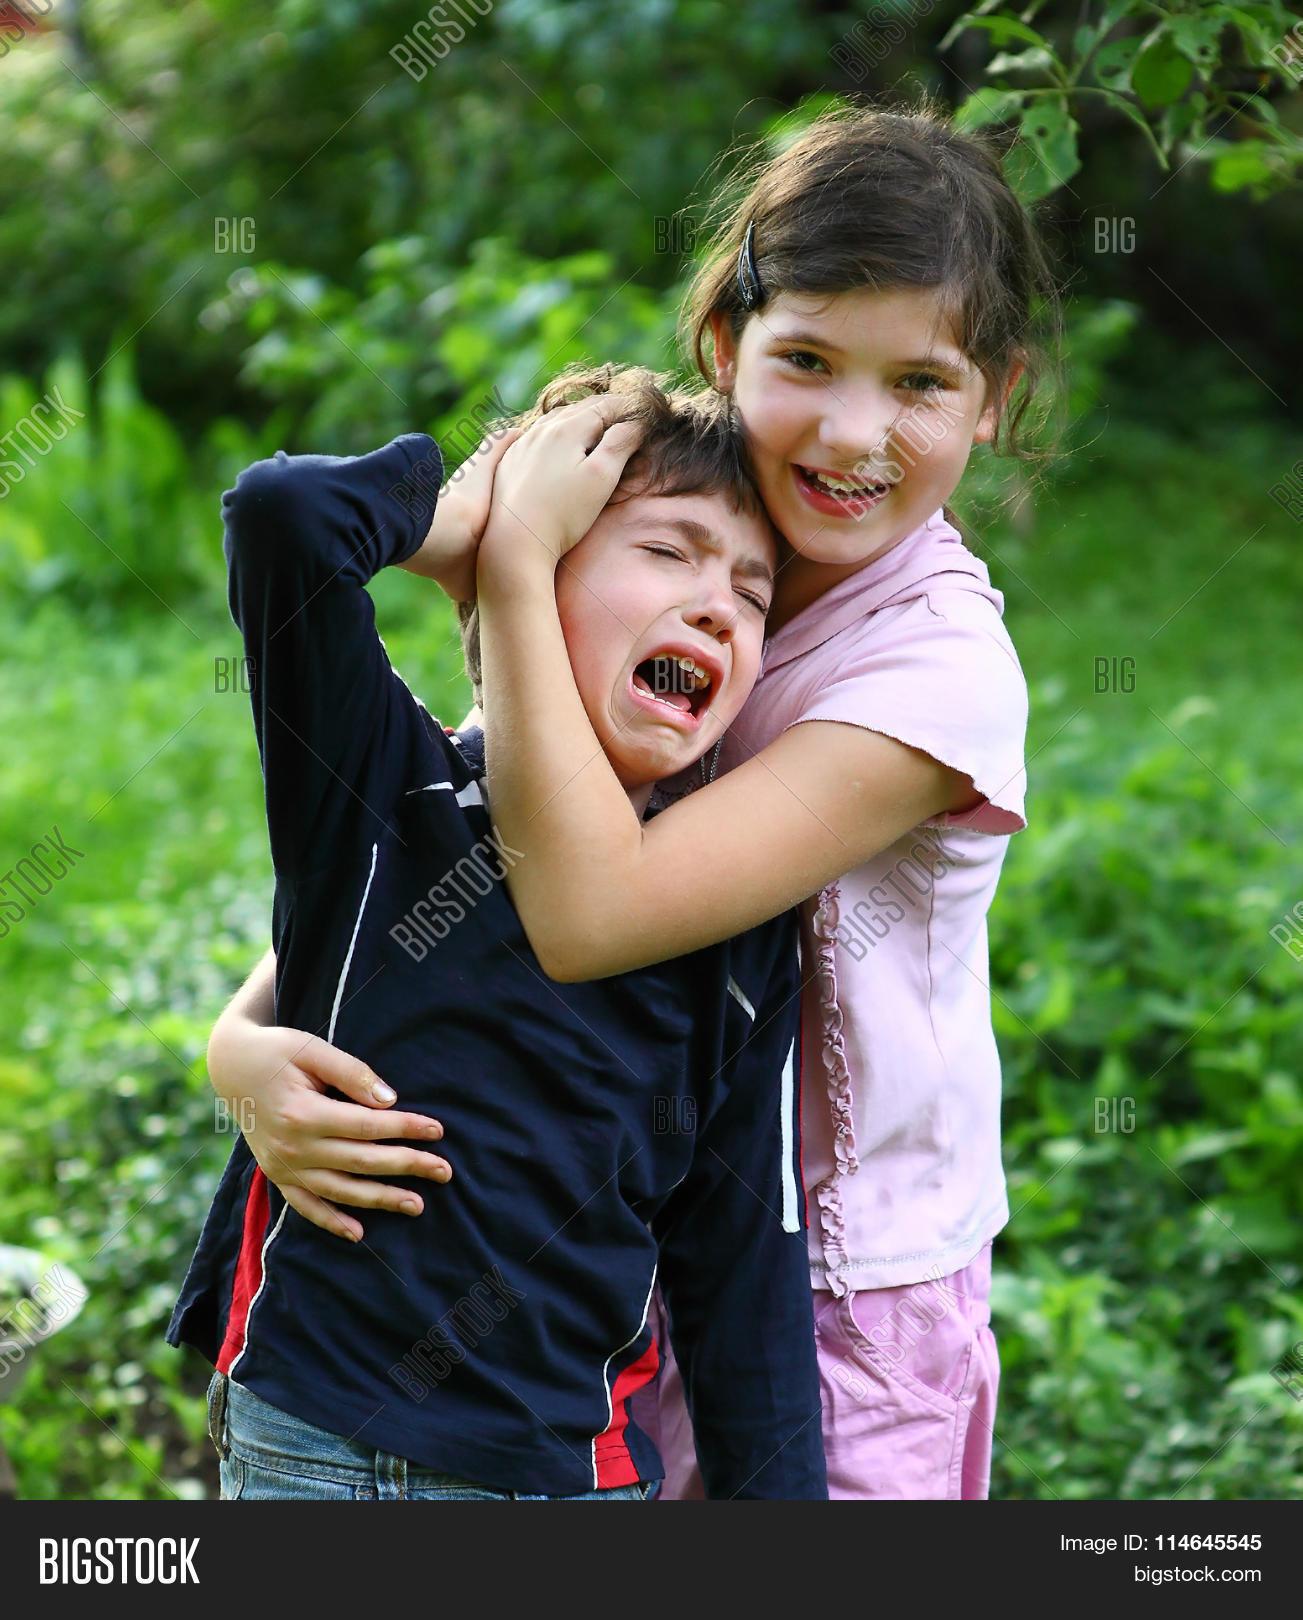 girl comforting image photo free trial bigstock